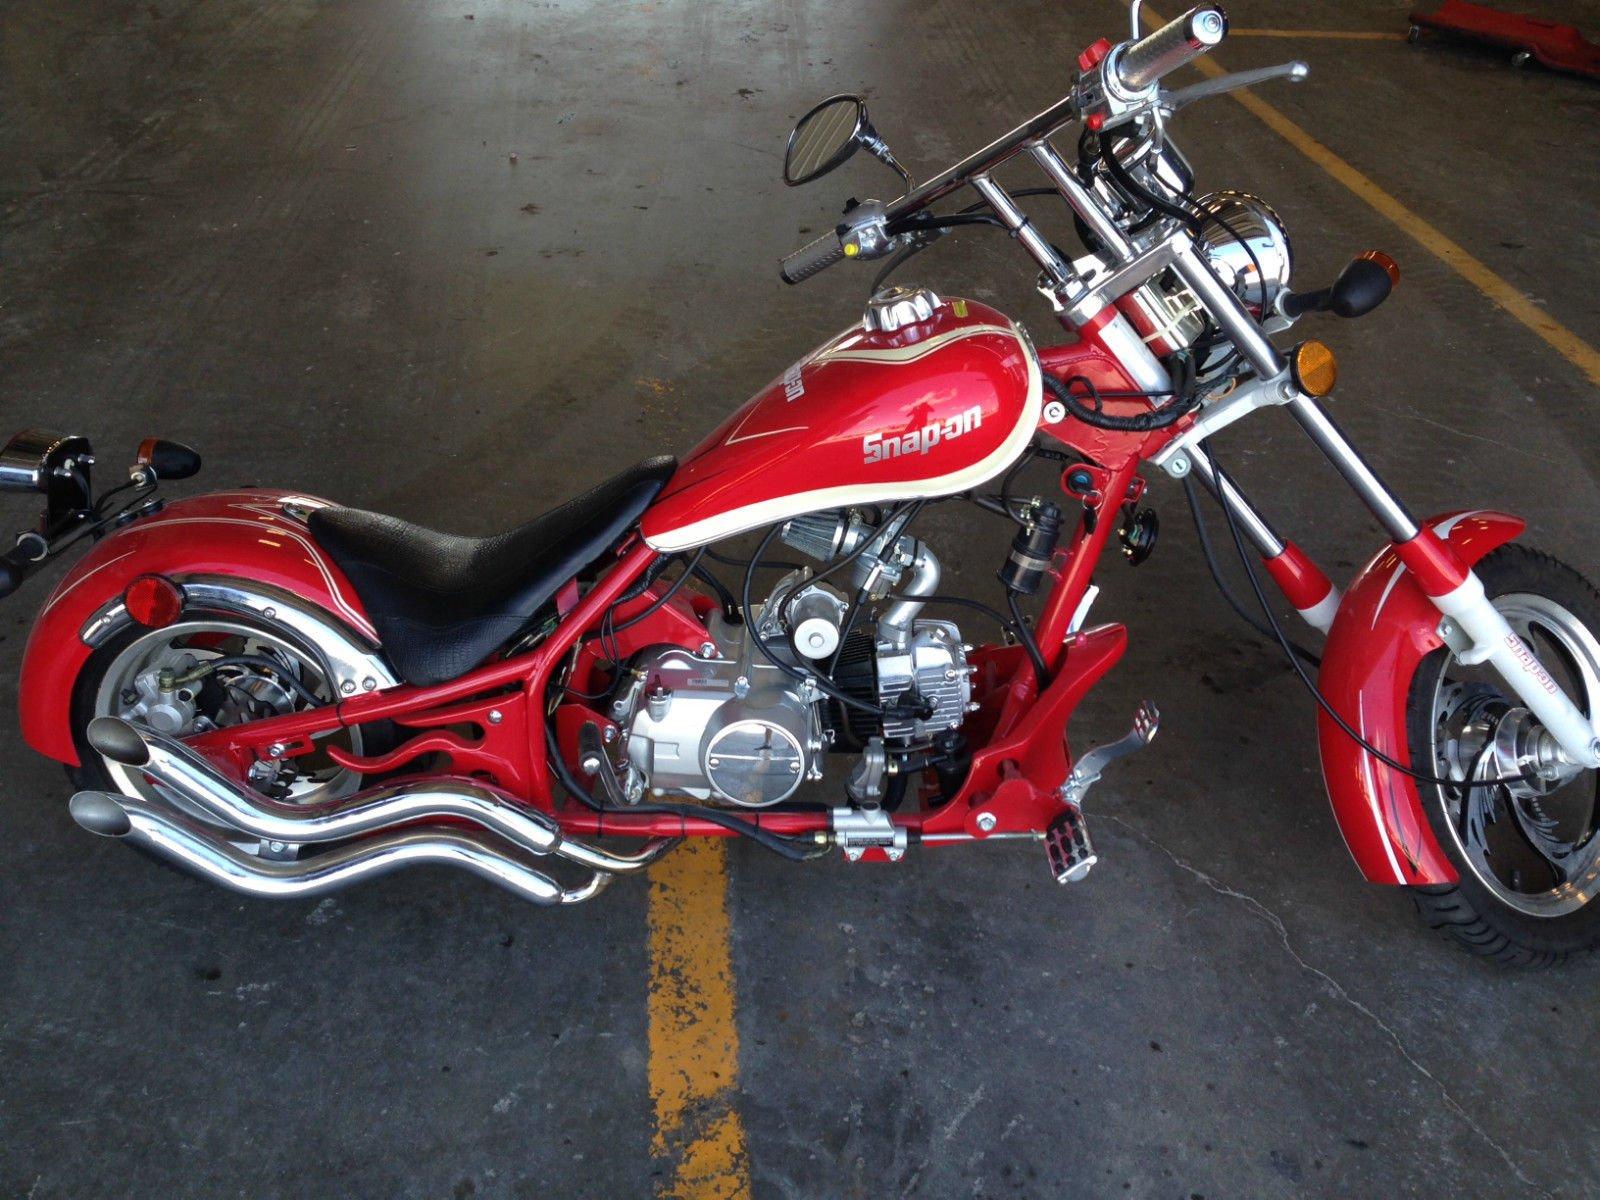 Chopper Motorbike Custom Bike Motorcycle Hot Rod Rods - Snap On 125cc Mini Chopper - HD Wallpaper